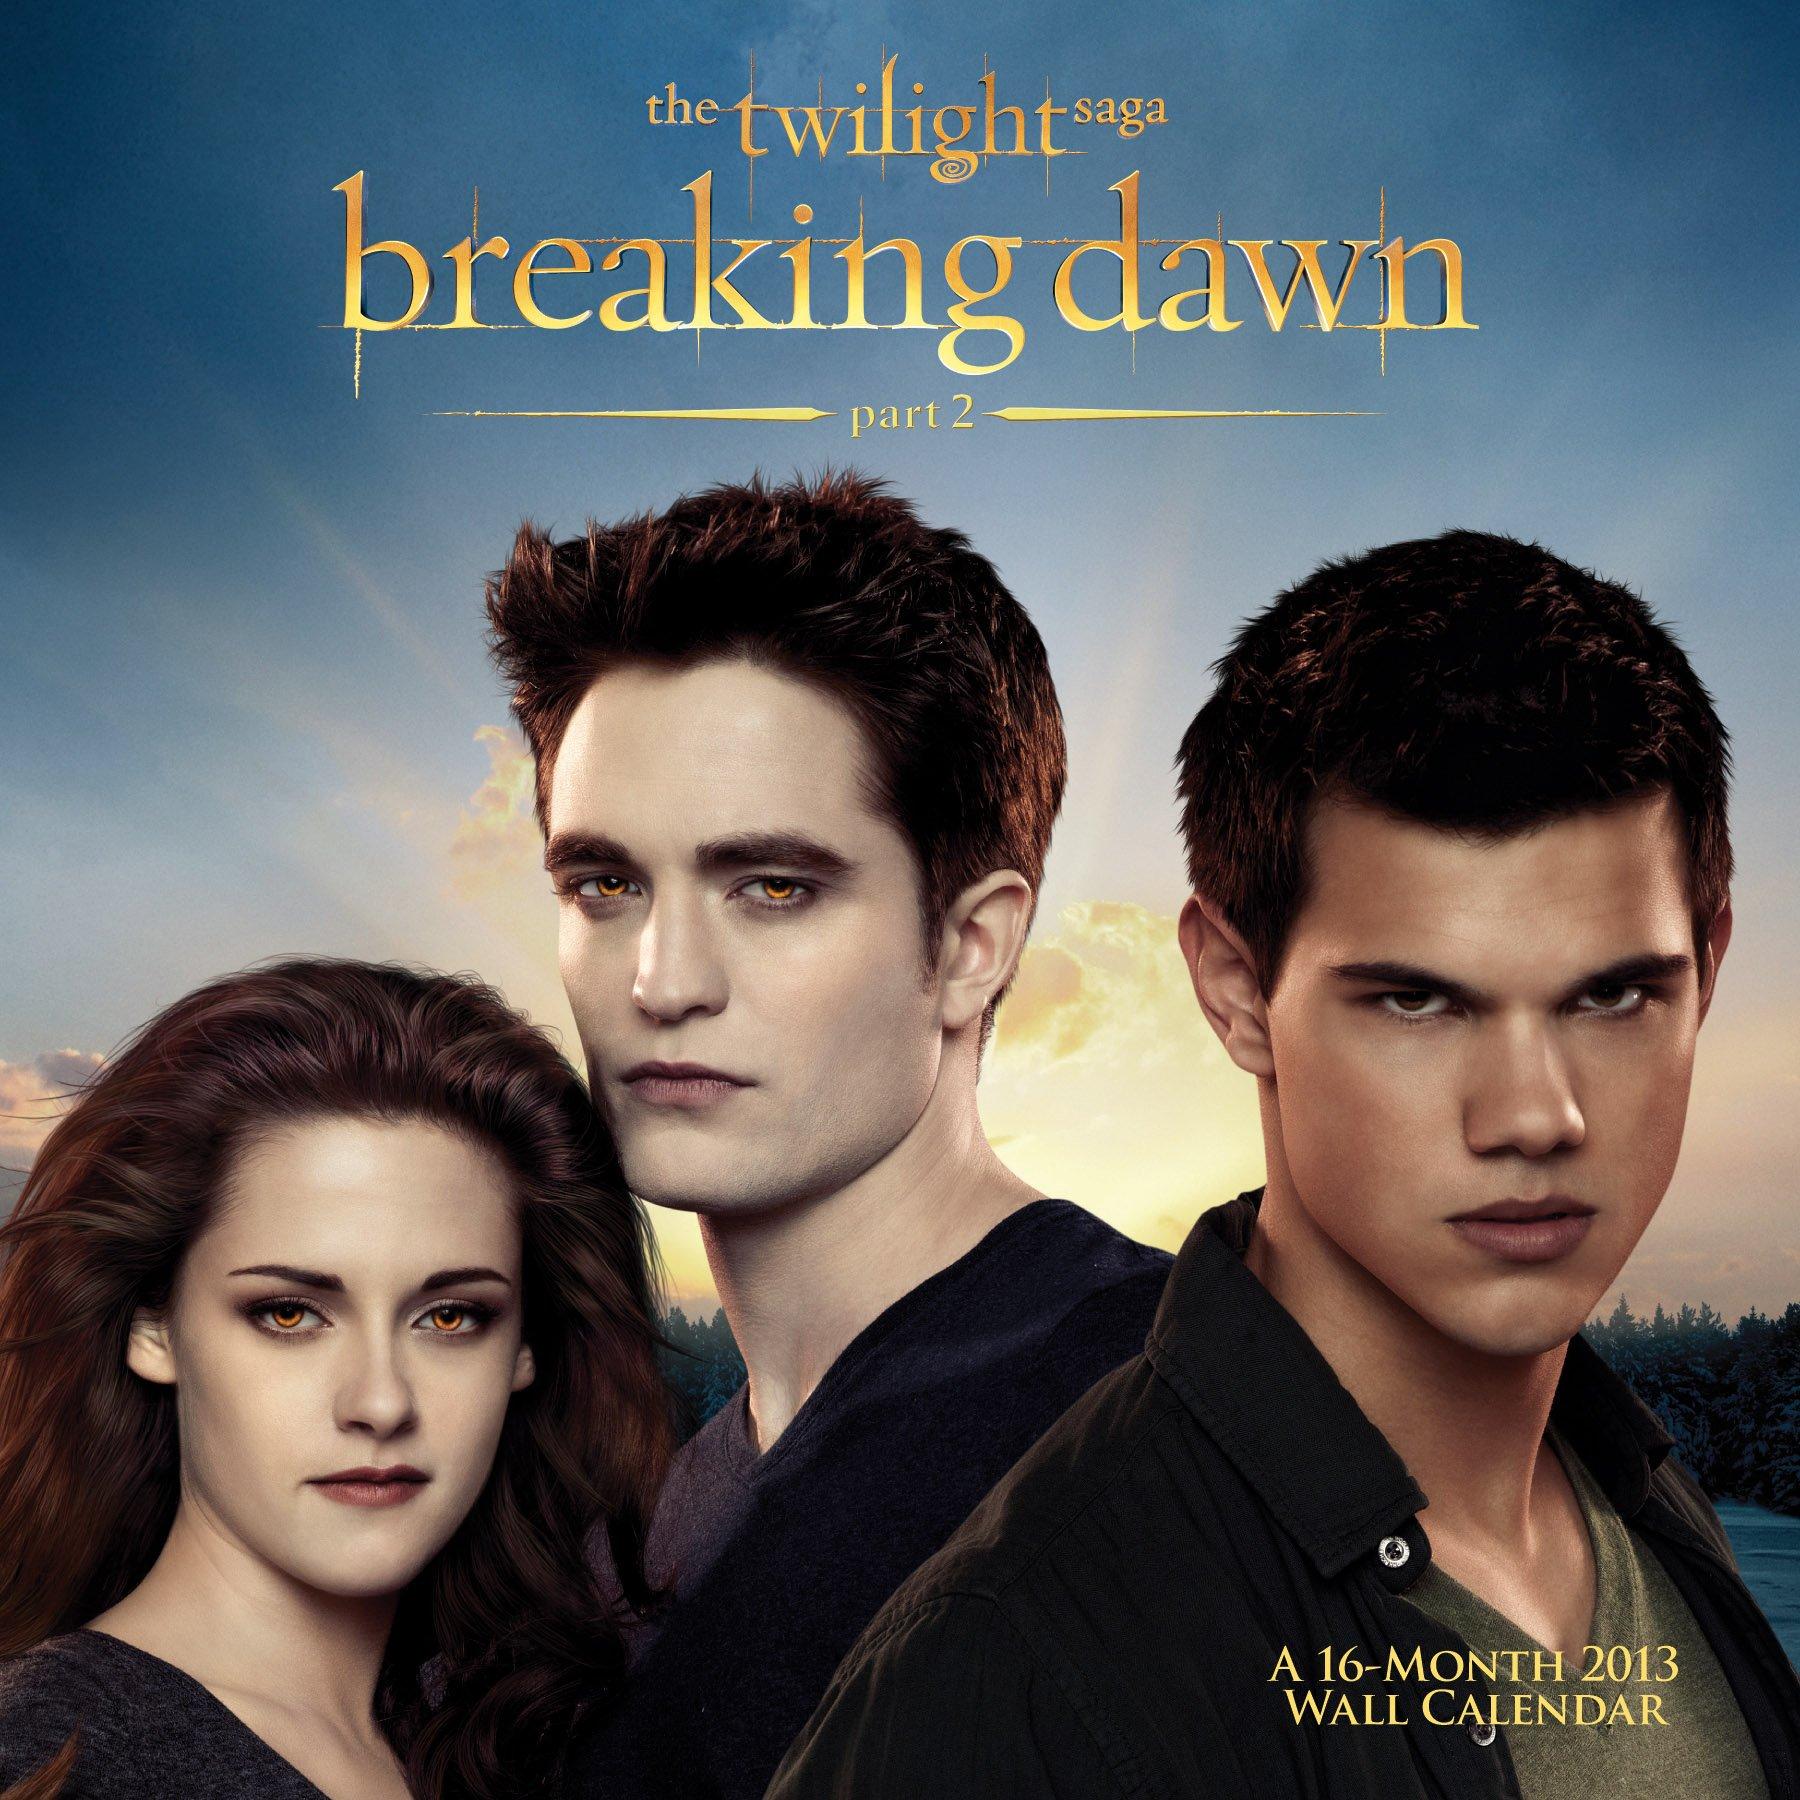 twilight saga breaking dawn part 2 all mp3 songs download